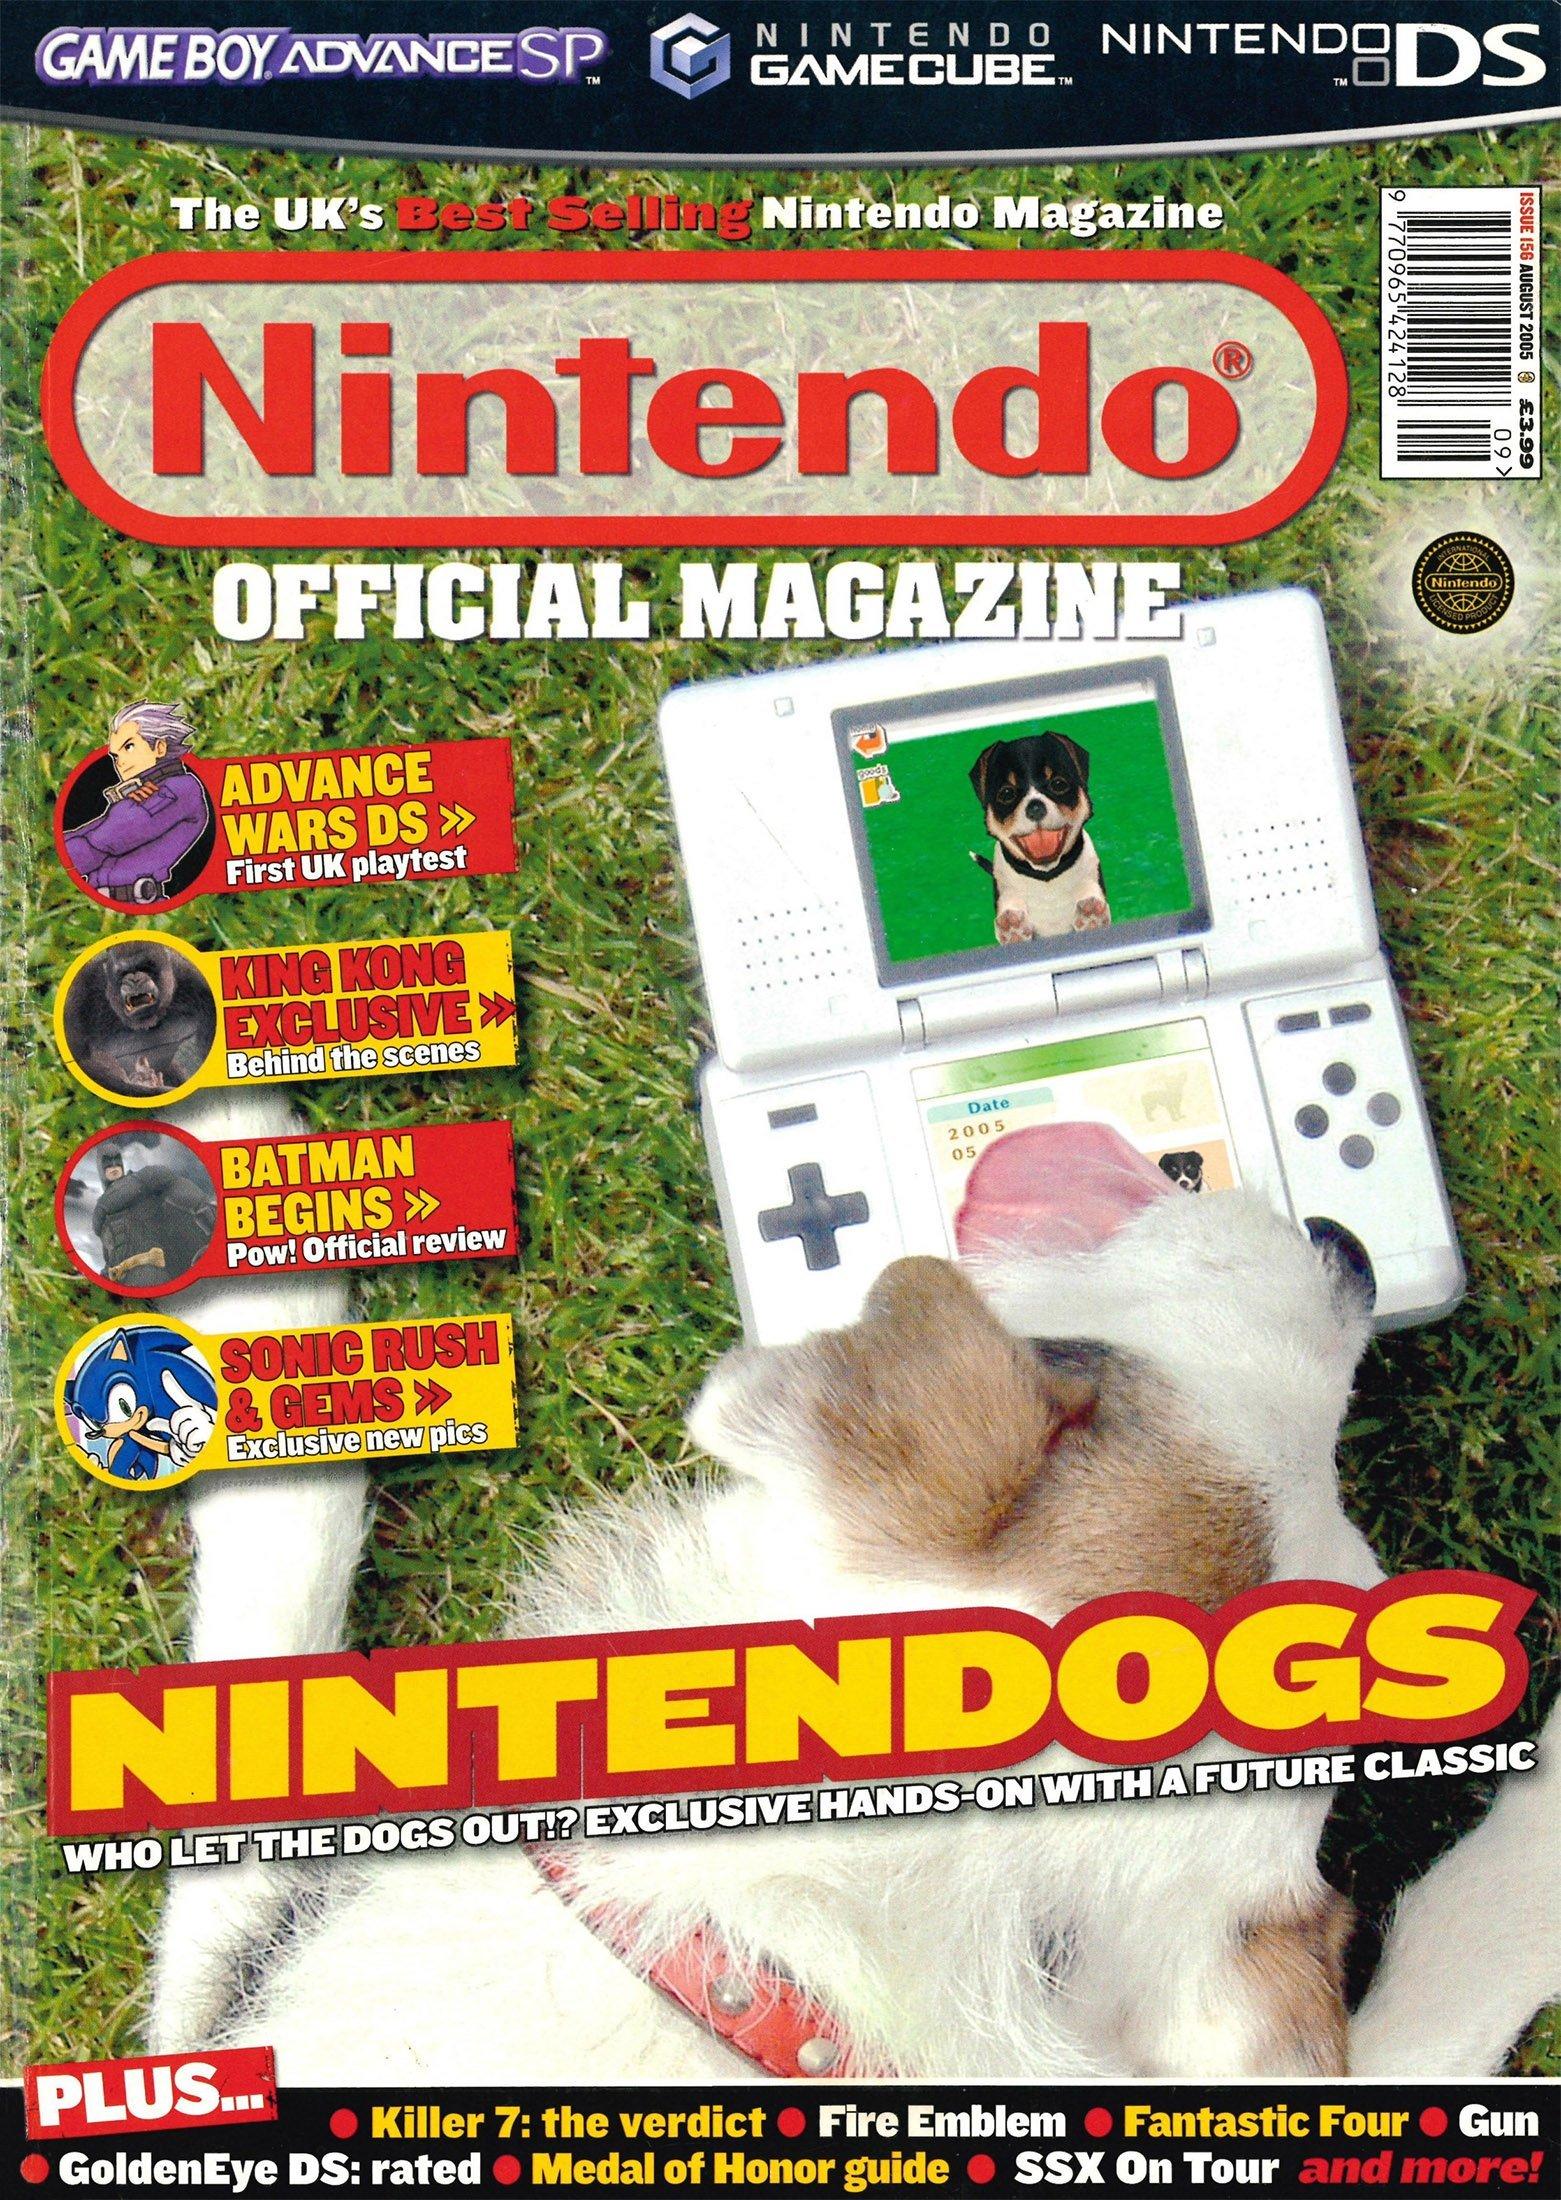 Nintendo Official Magazine 156 (August 2005)